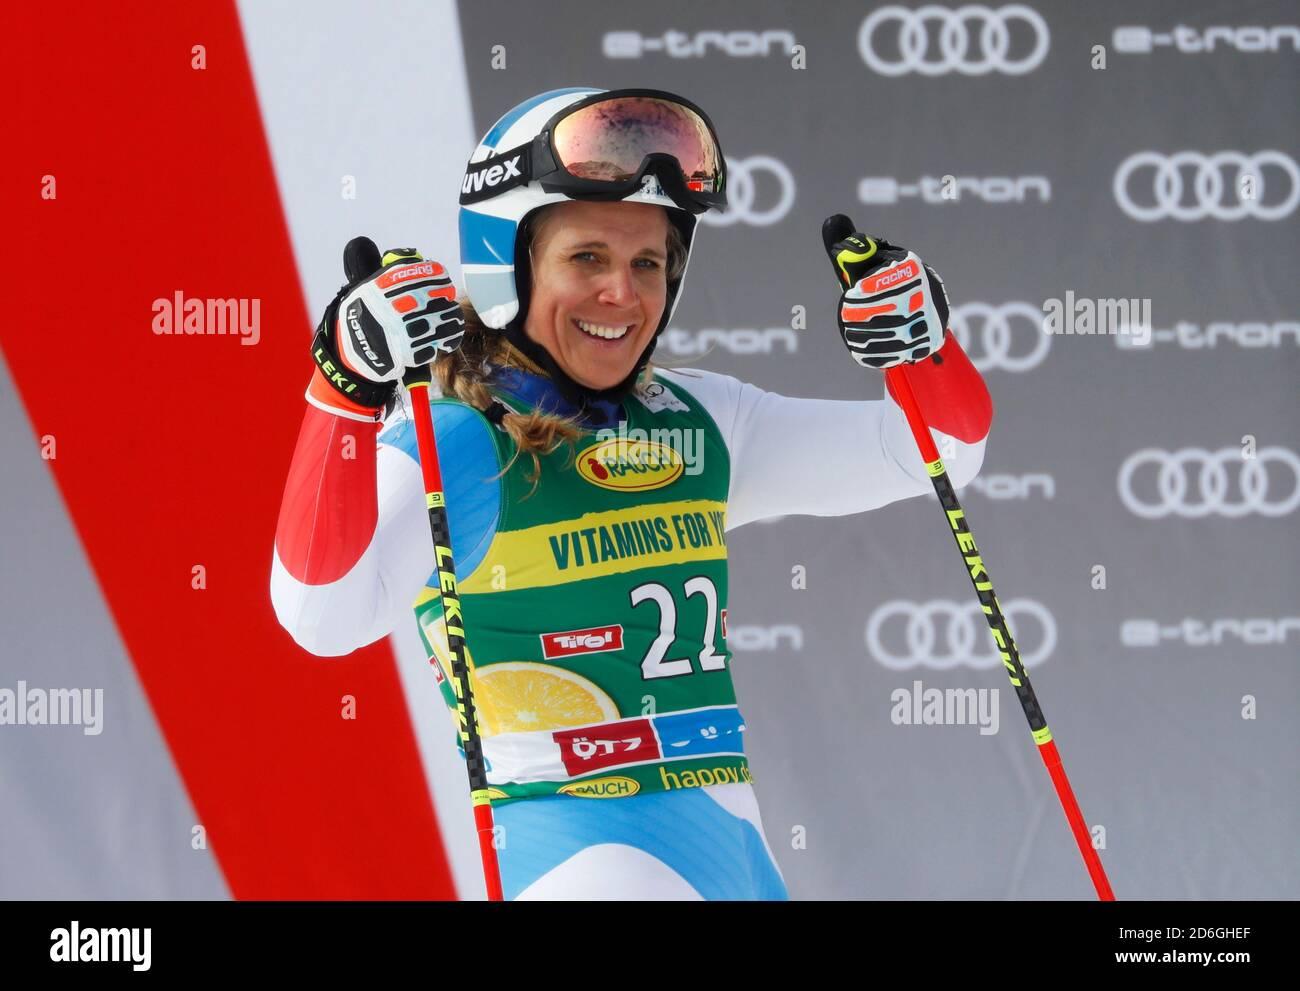 Alpine Skiing - FIS Ski World Cup - Soelden - Women's Giant Slalom - Soelden, Austria - 17 de octubre de 2020 la Suiza Andrea Ellenberger reacciona después de su segunda carrera REUTERS/Leonhard Foeger Foto de stock